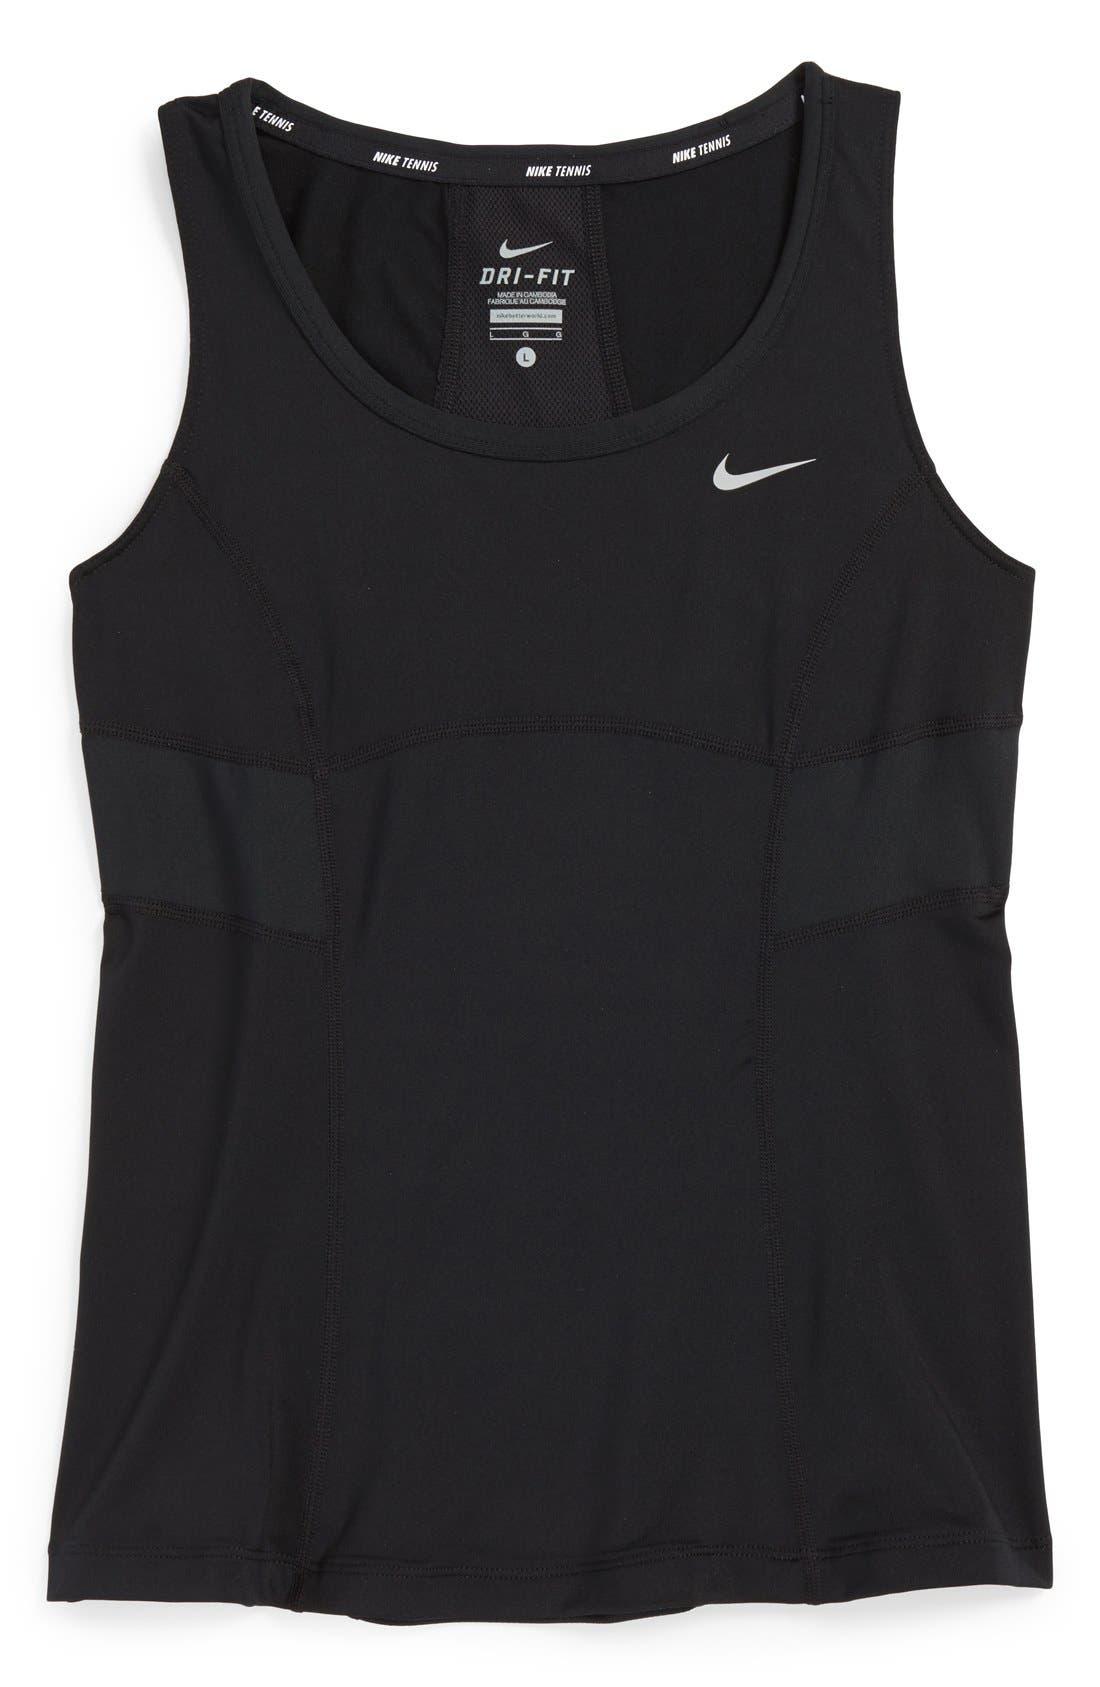 Alternate Image 1 Selected - Nike 'Power' Tennis Tank Top (Big Girls)